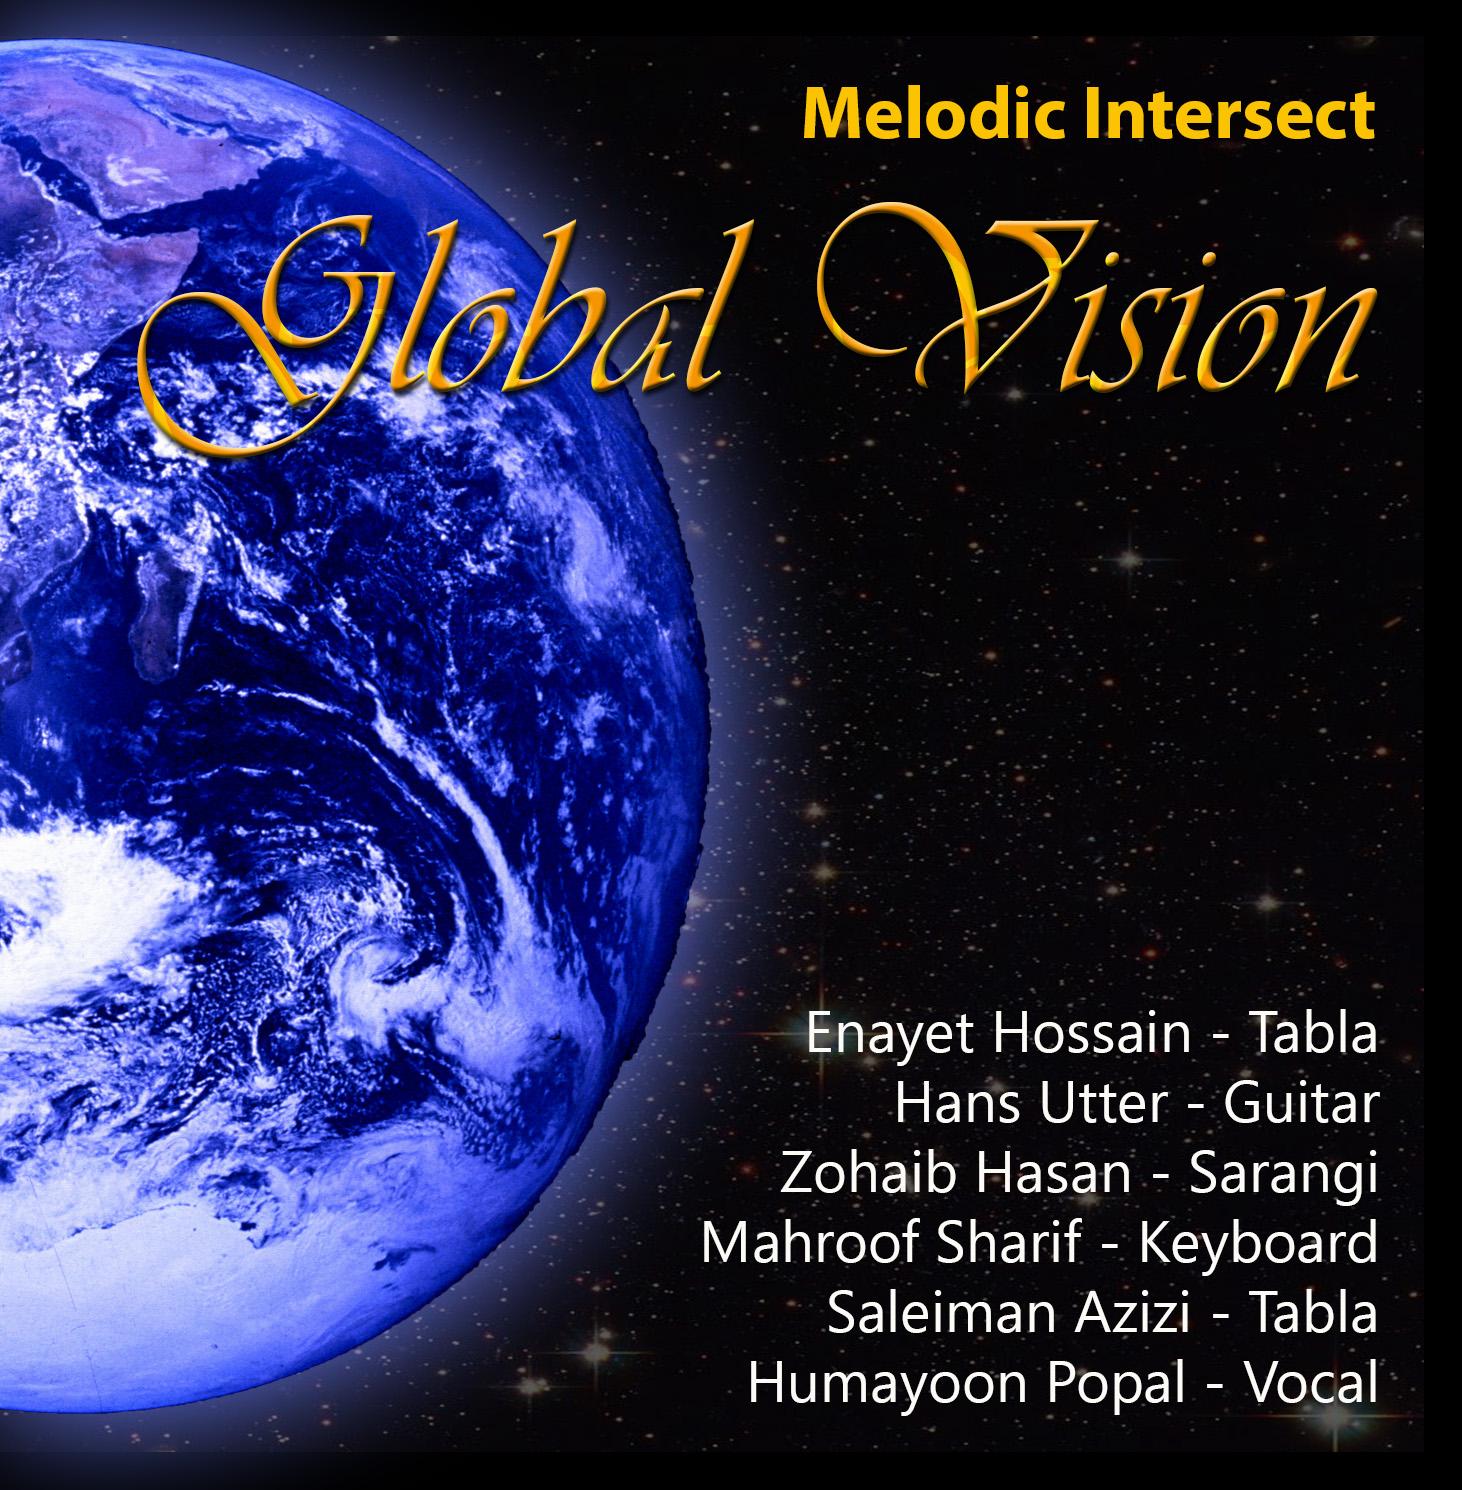 globalvision.jpg